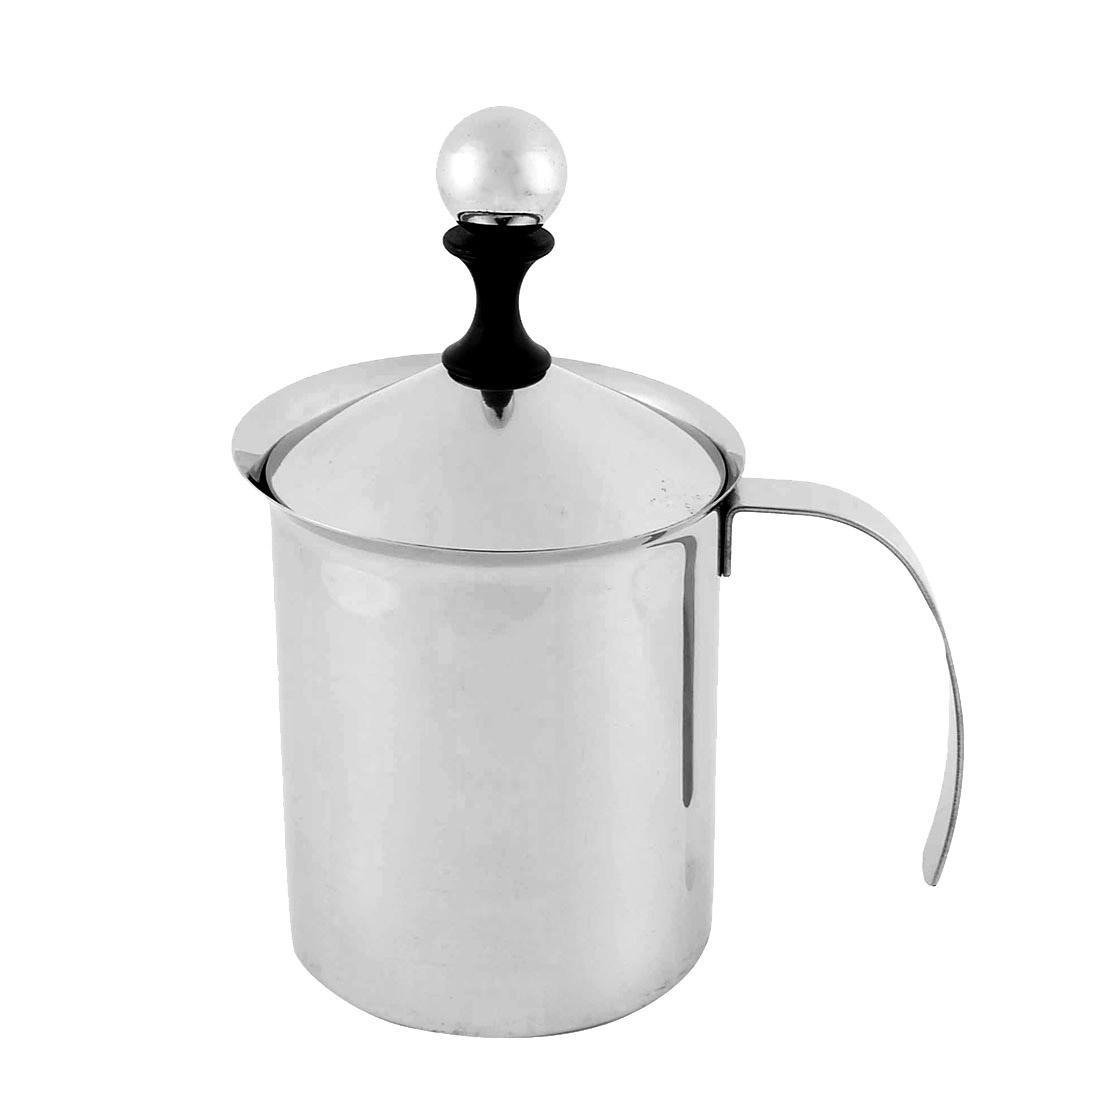 Household Stainless Steel Double Mesh Milk Creamer Silver Tone 800ml Capacity